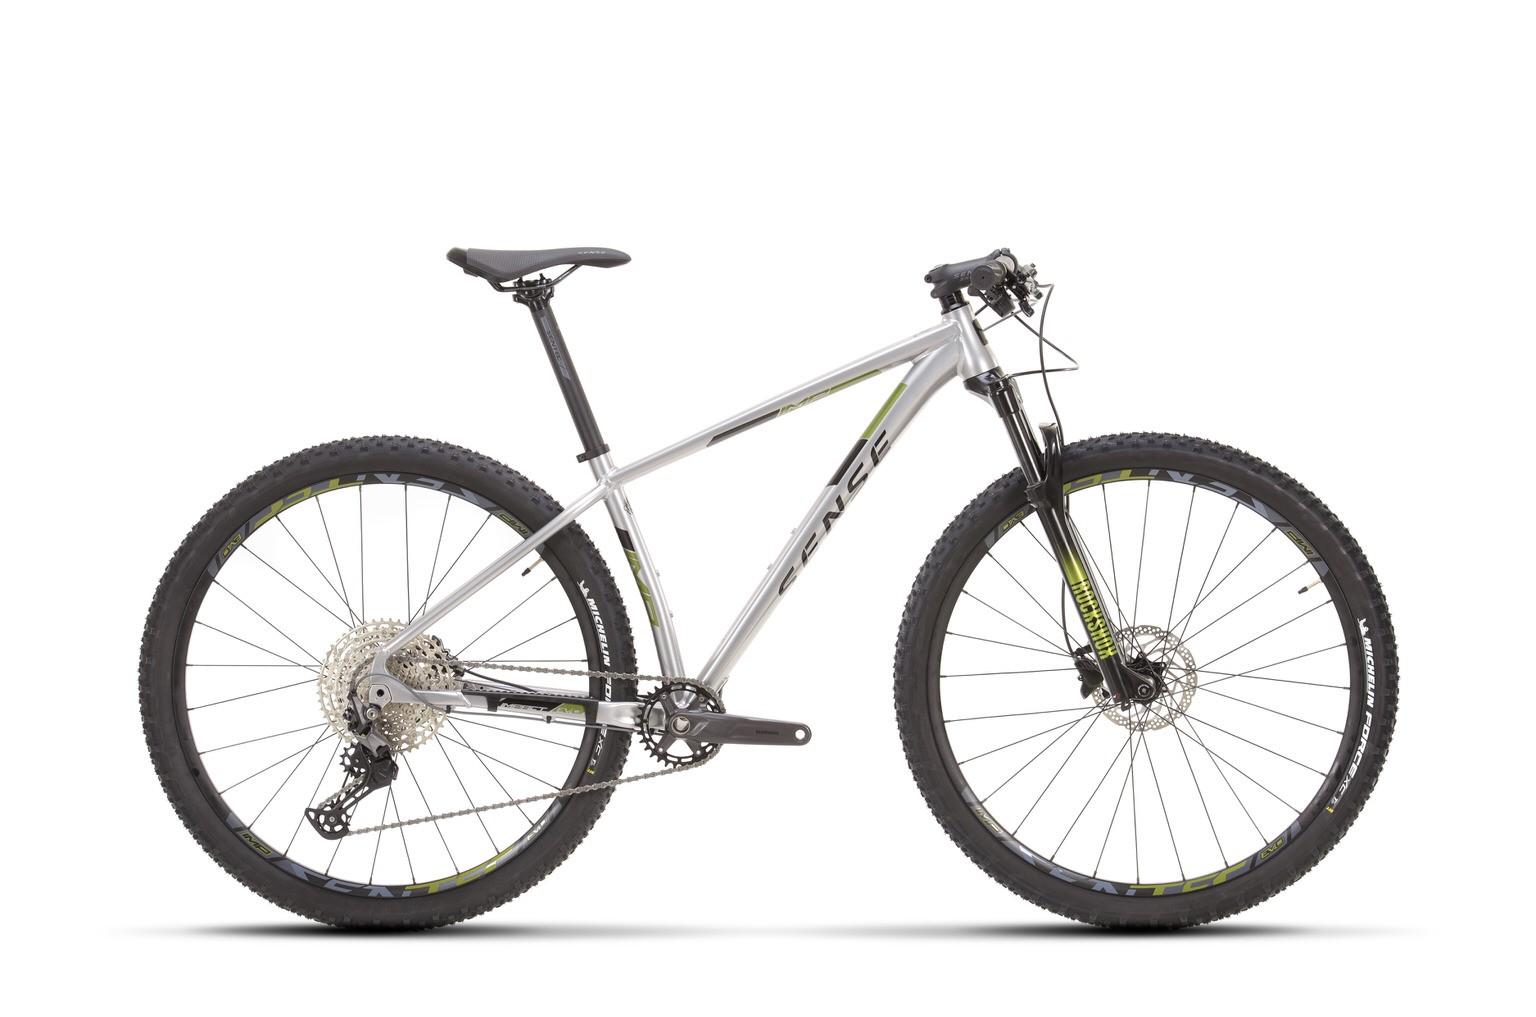 Bicicleta MTB Sense Impact Evo  2021/22 1X12V Deore Verde